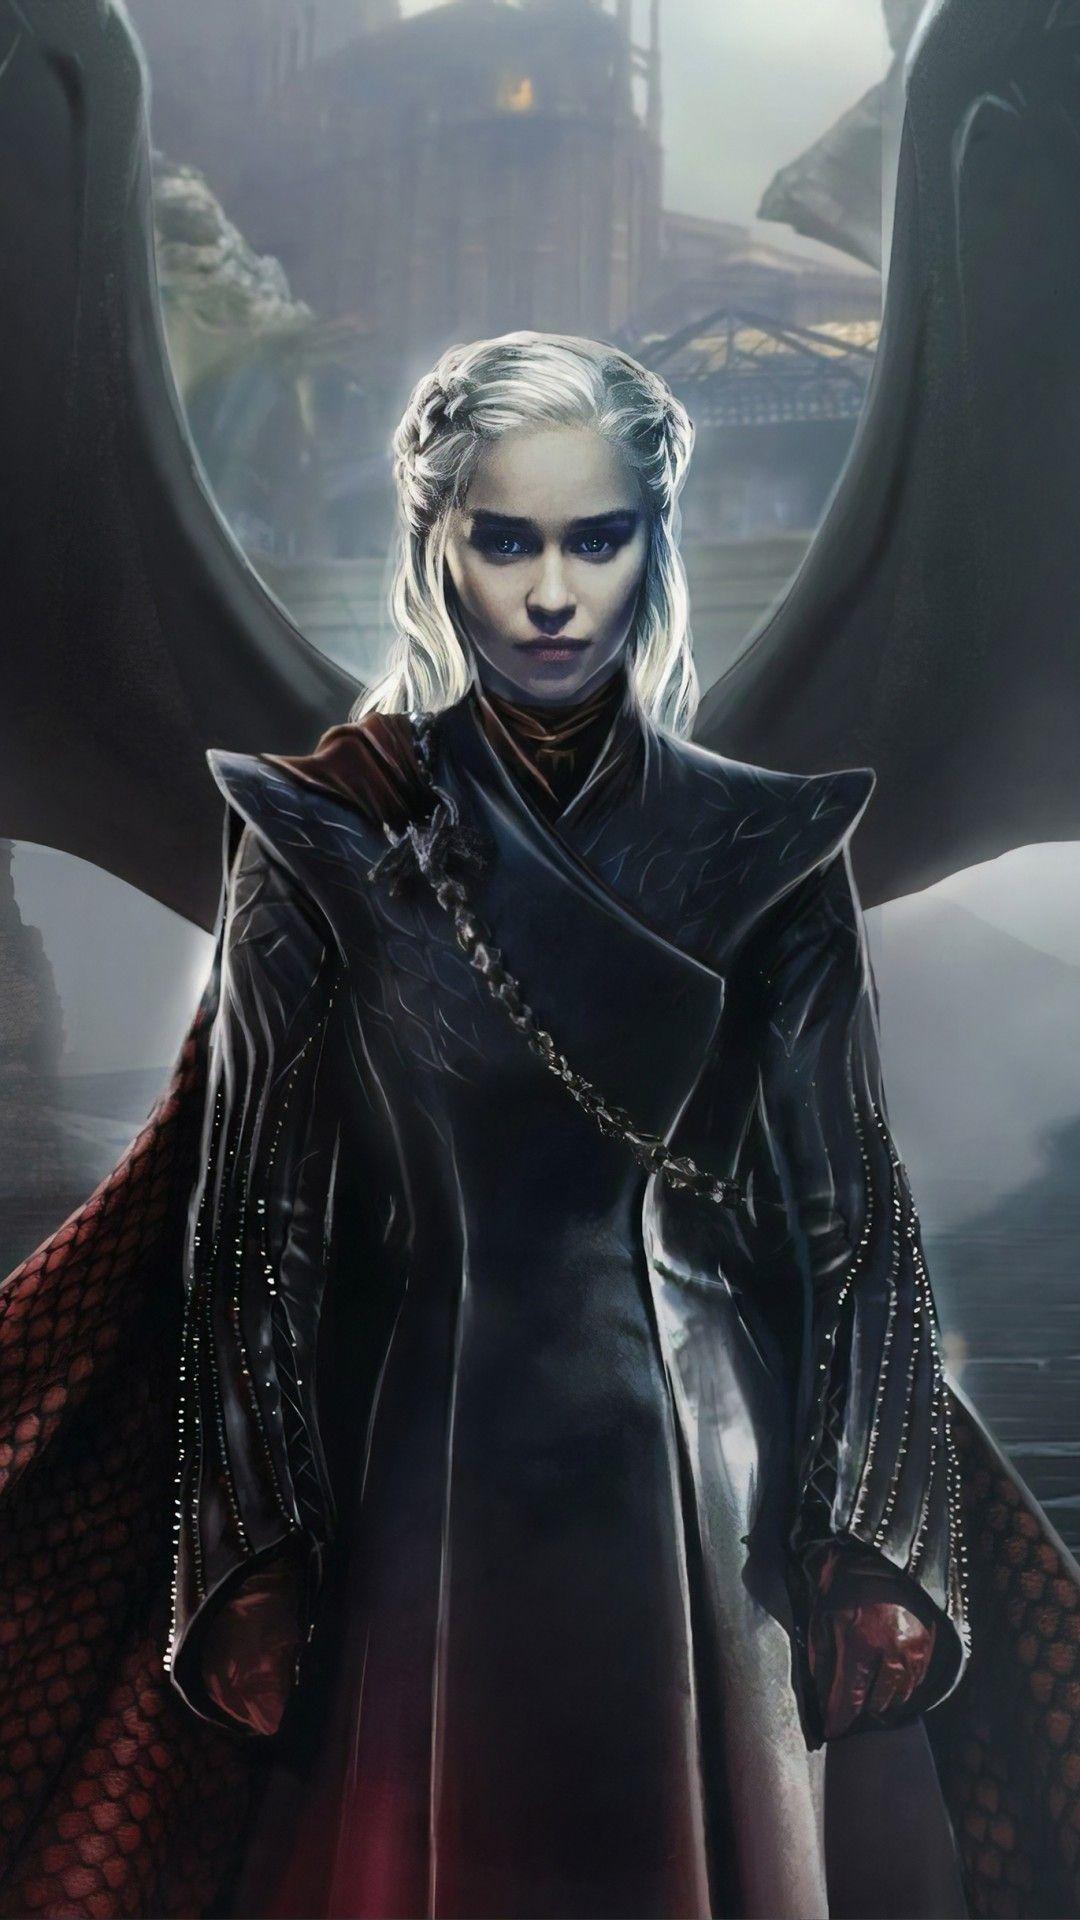 Daenerys Targaryen Game Of Thrones In 2020 Daenerys Targaryen Art Game Of Thrones Art Targaryen Art